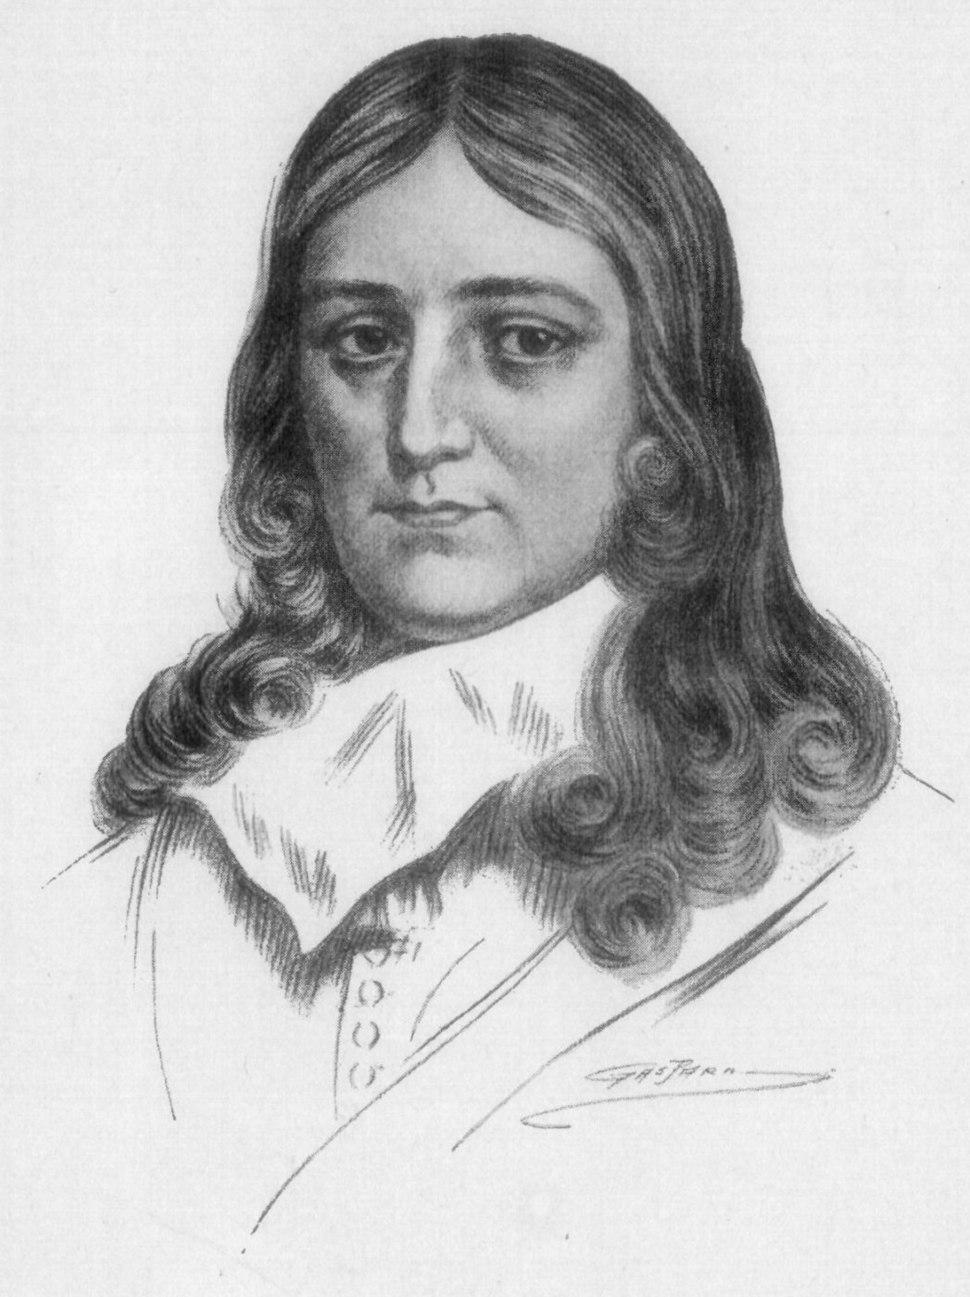 John Milton - Project Gutenberg eText 13619